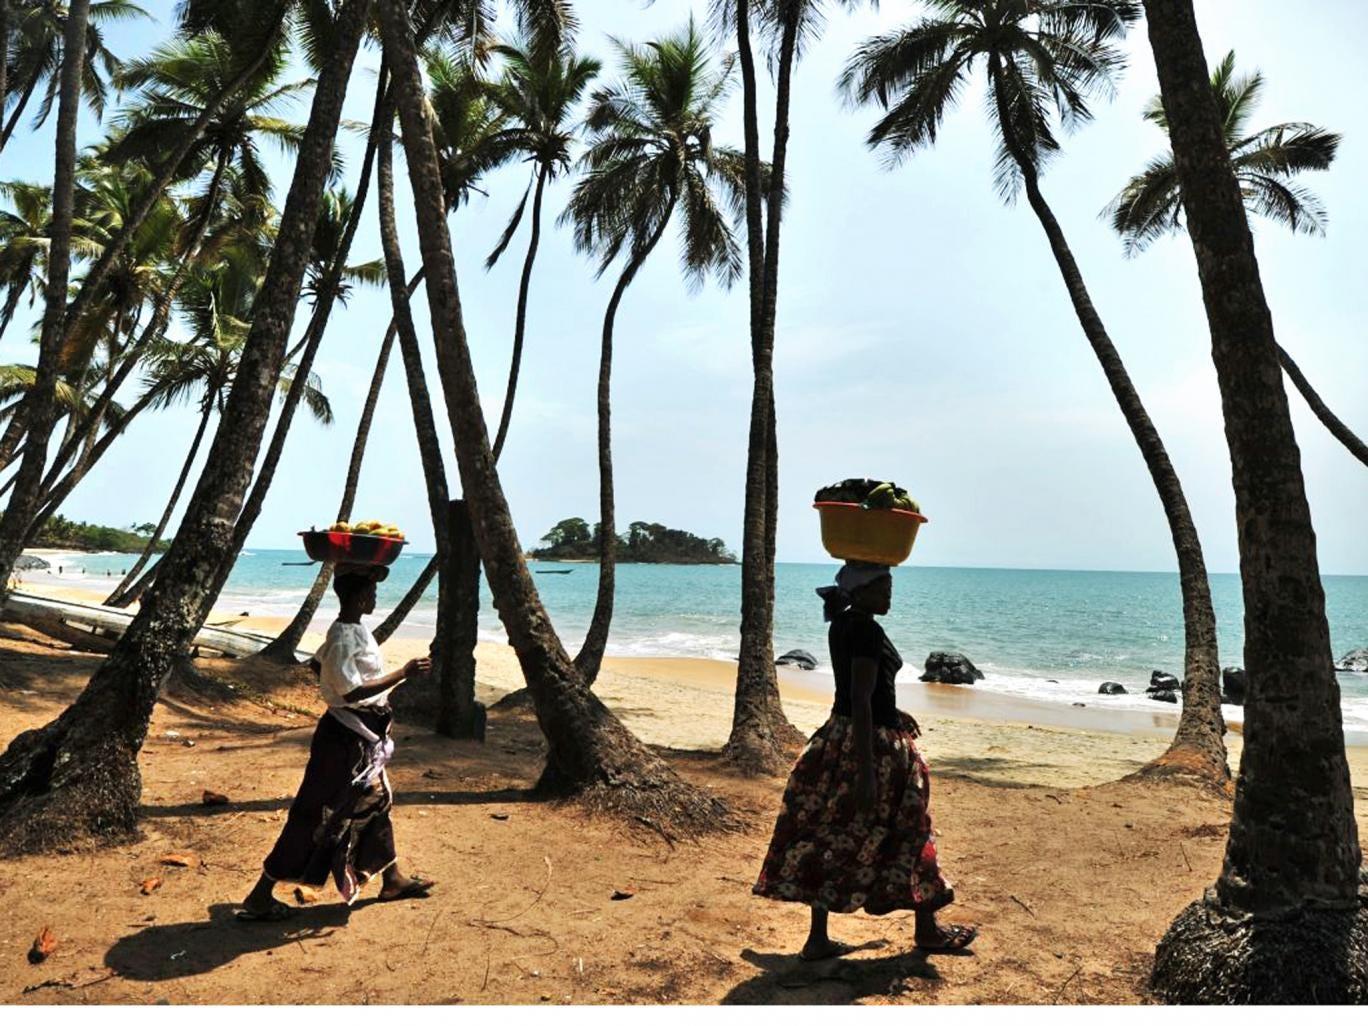 Balancing act: a beach in Sierra Leone, West Africa